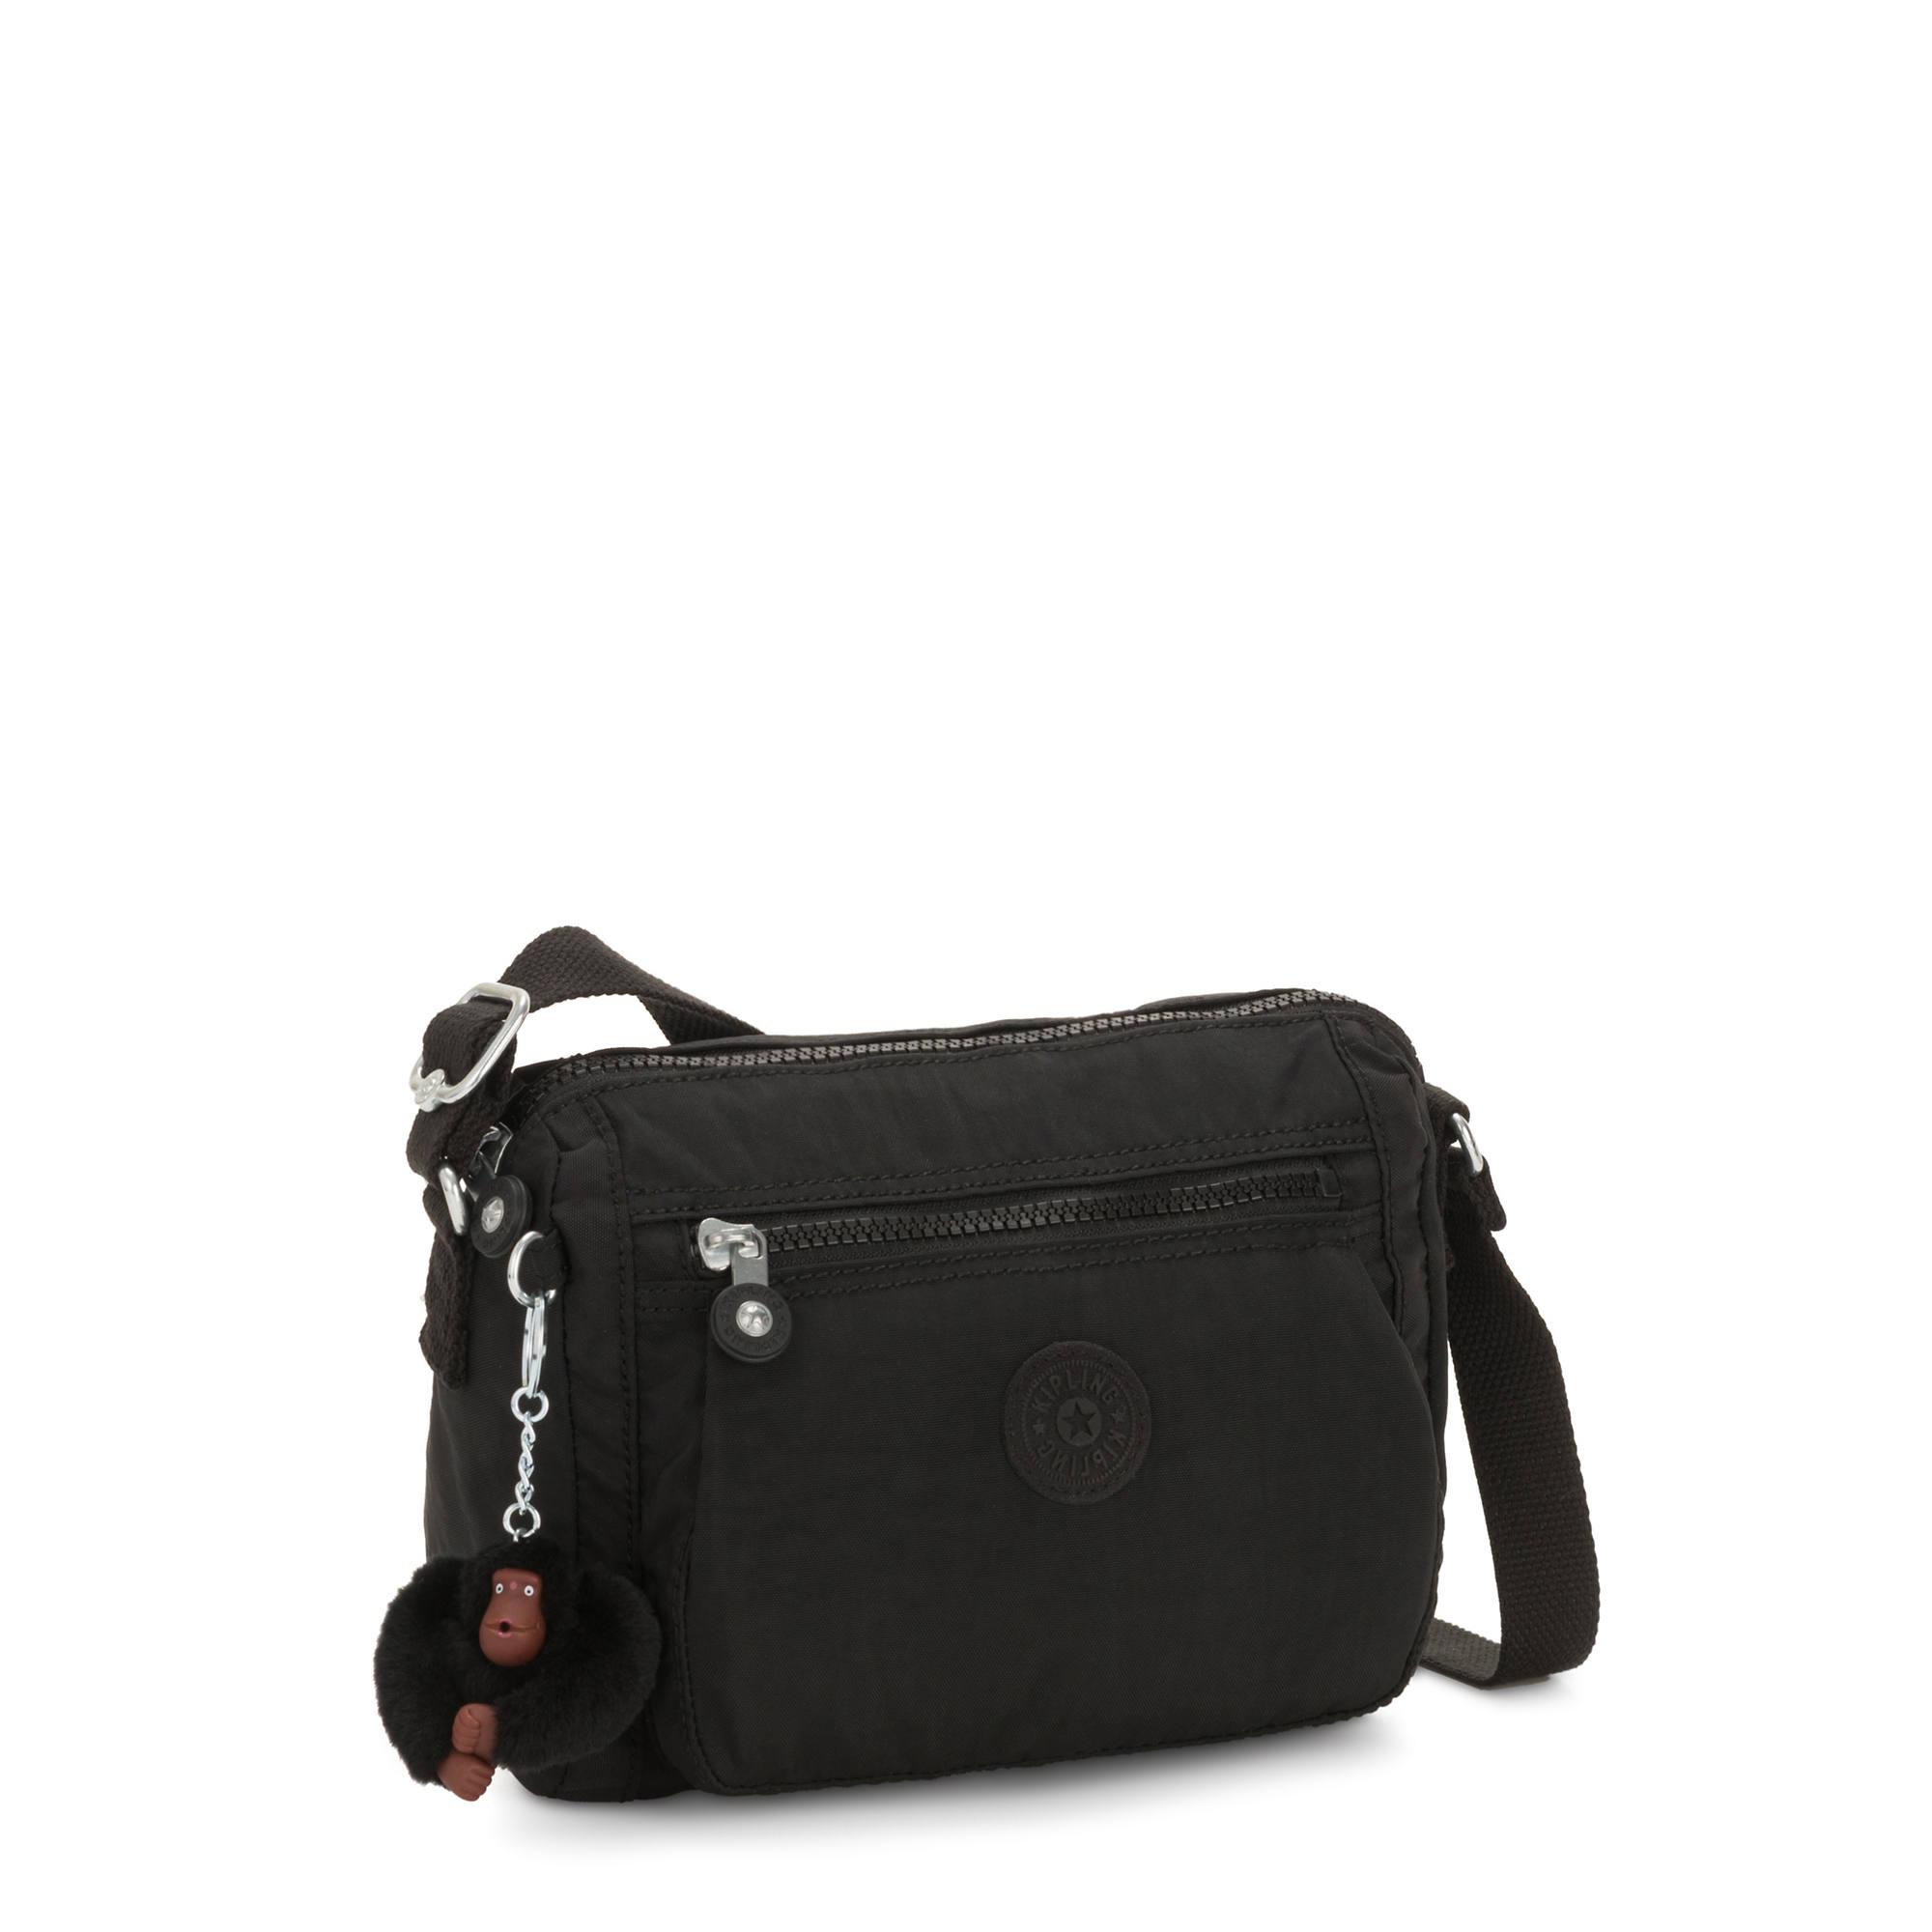 Kipling Chando Crossbody Bag